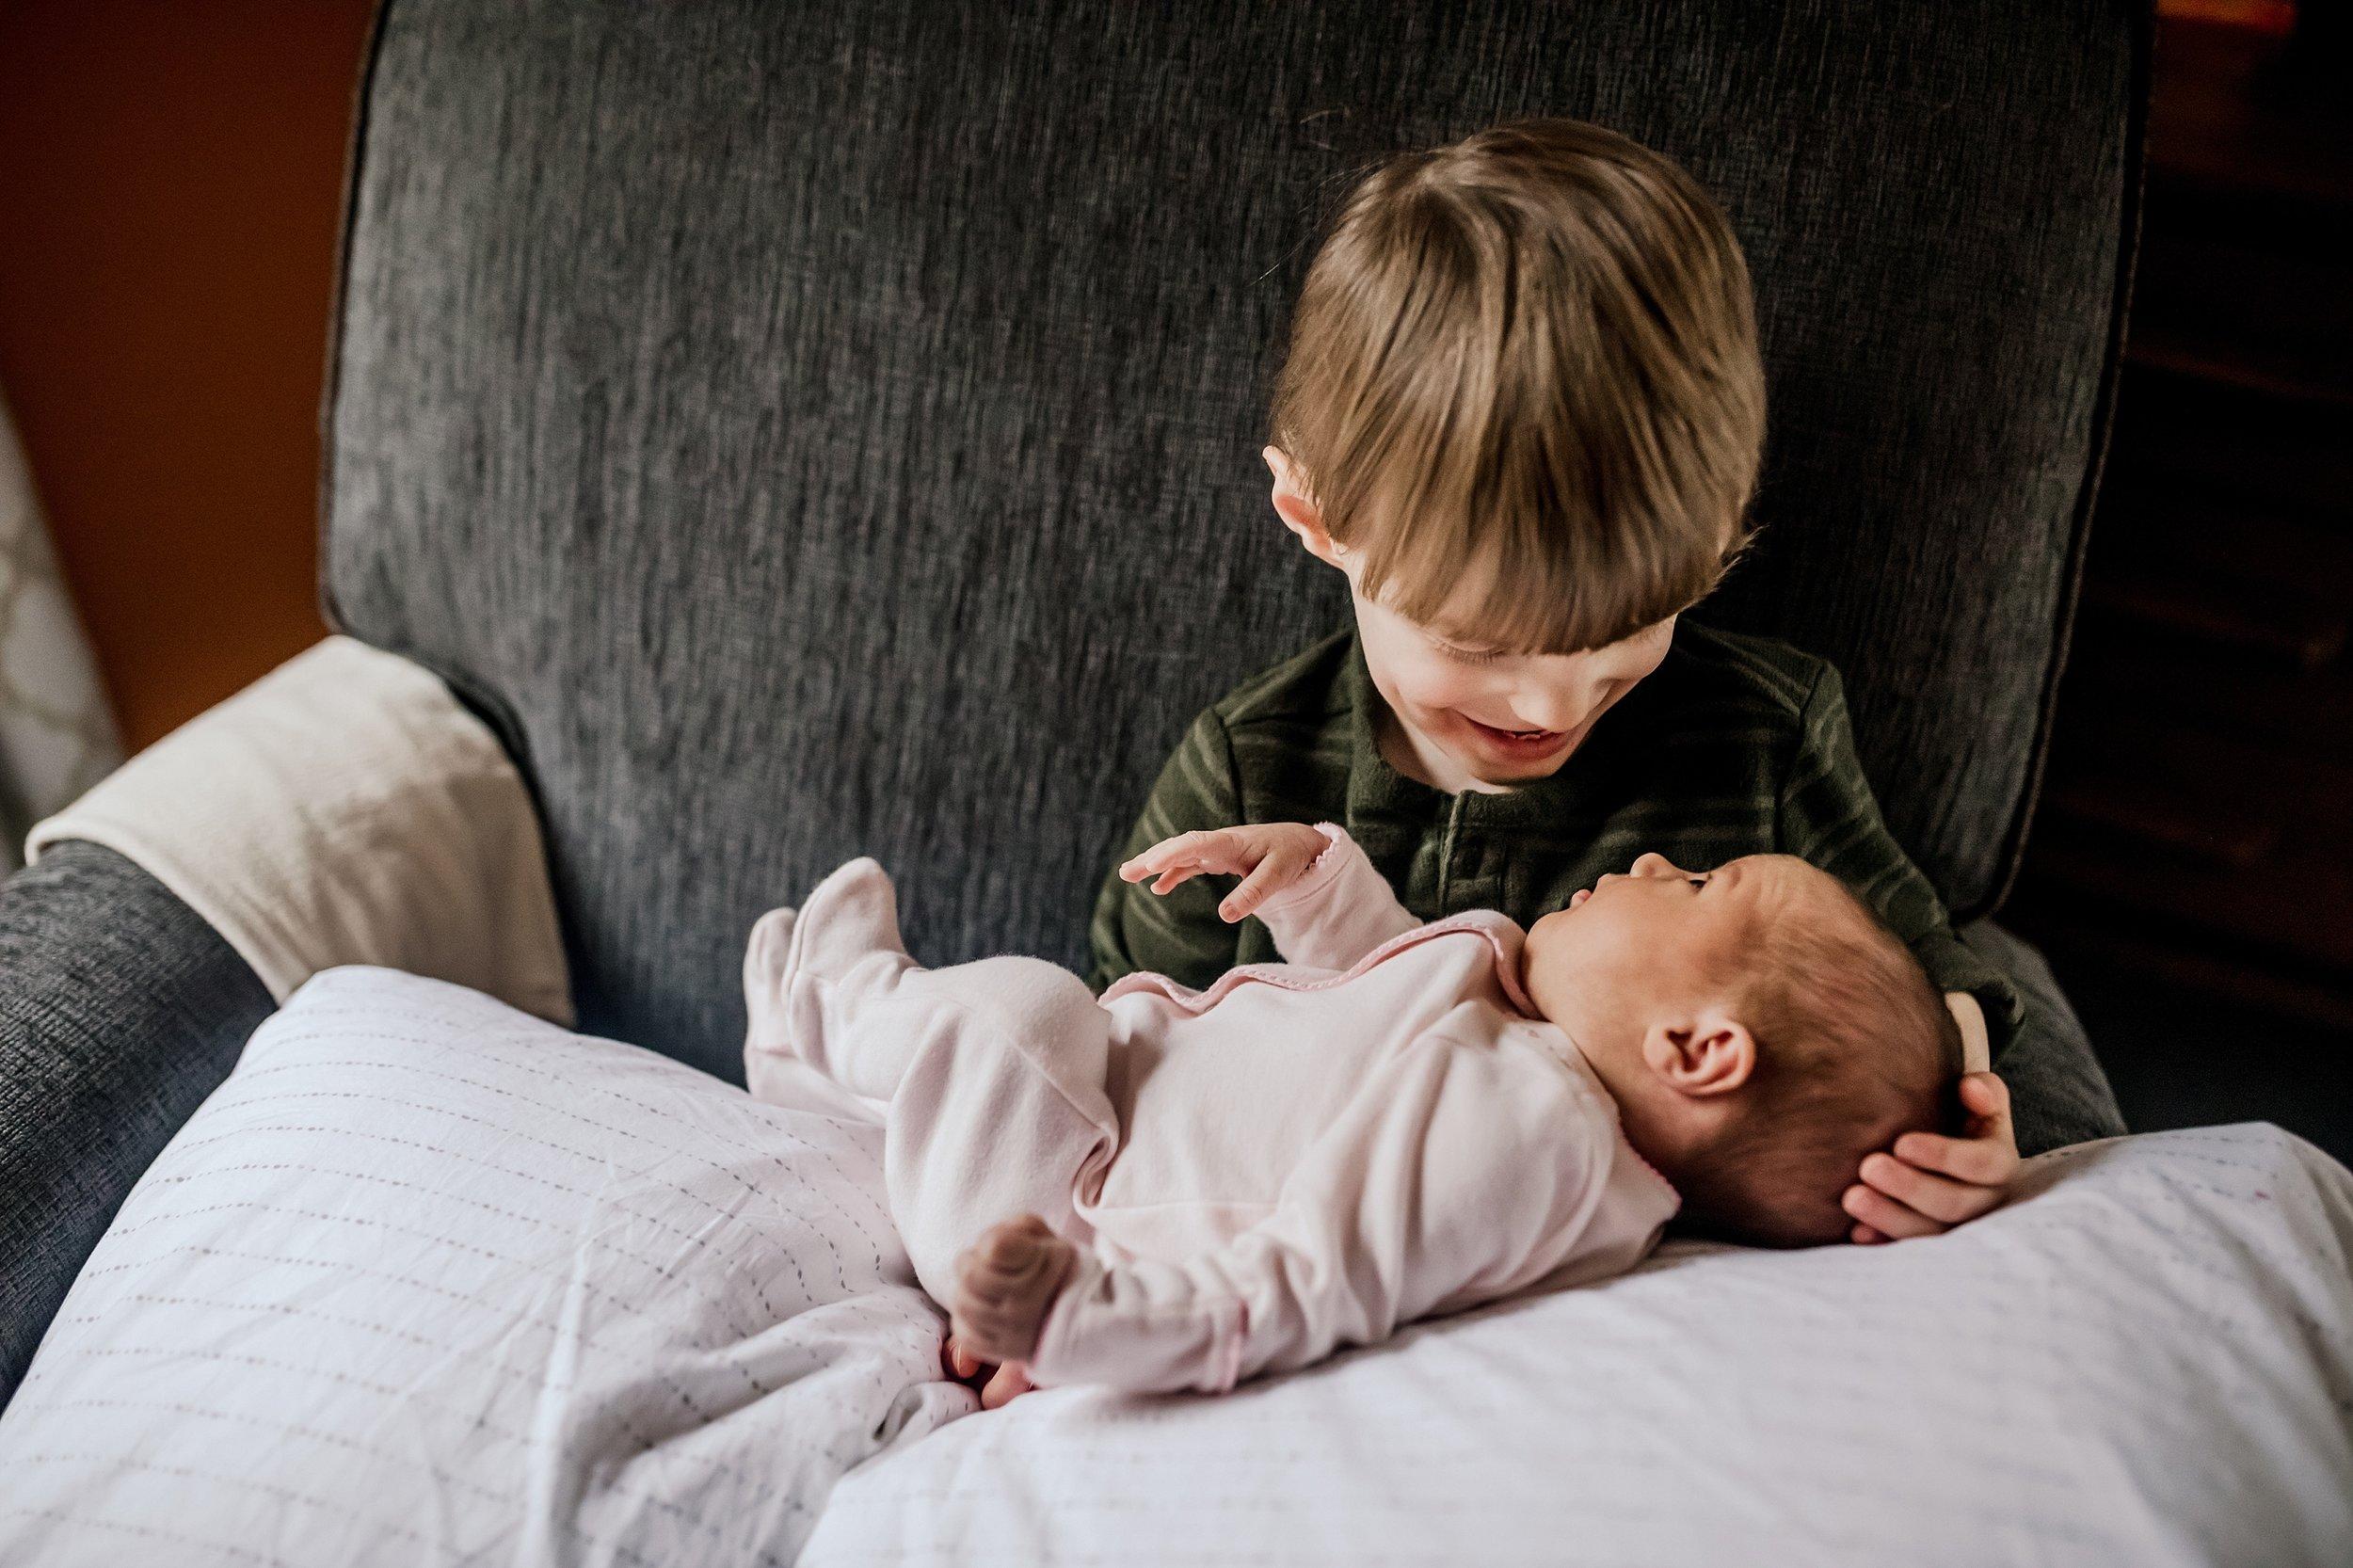 Lehigh-Valley-Newborn-Documentary-Photographer_0050.jpg